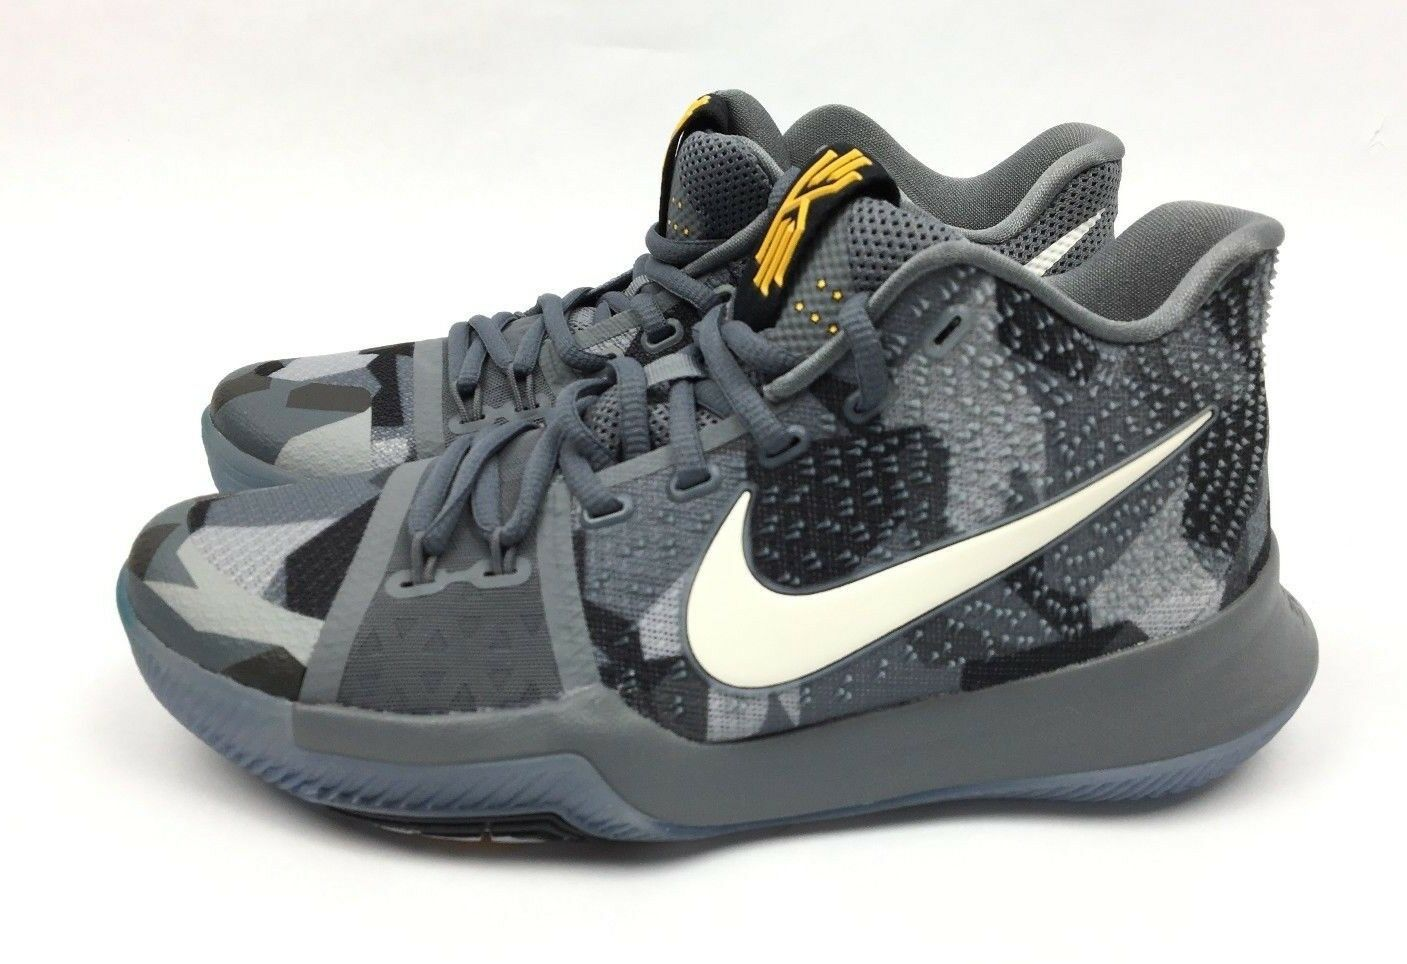 Nike Kyrie 3 Mens Basketball Shoes Girls EYBL Rare Sample Grey SZ  7 942206-002